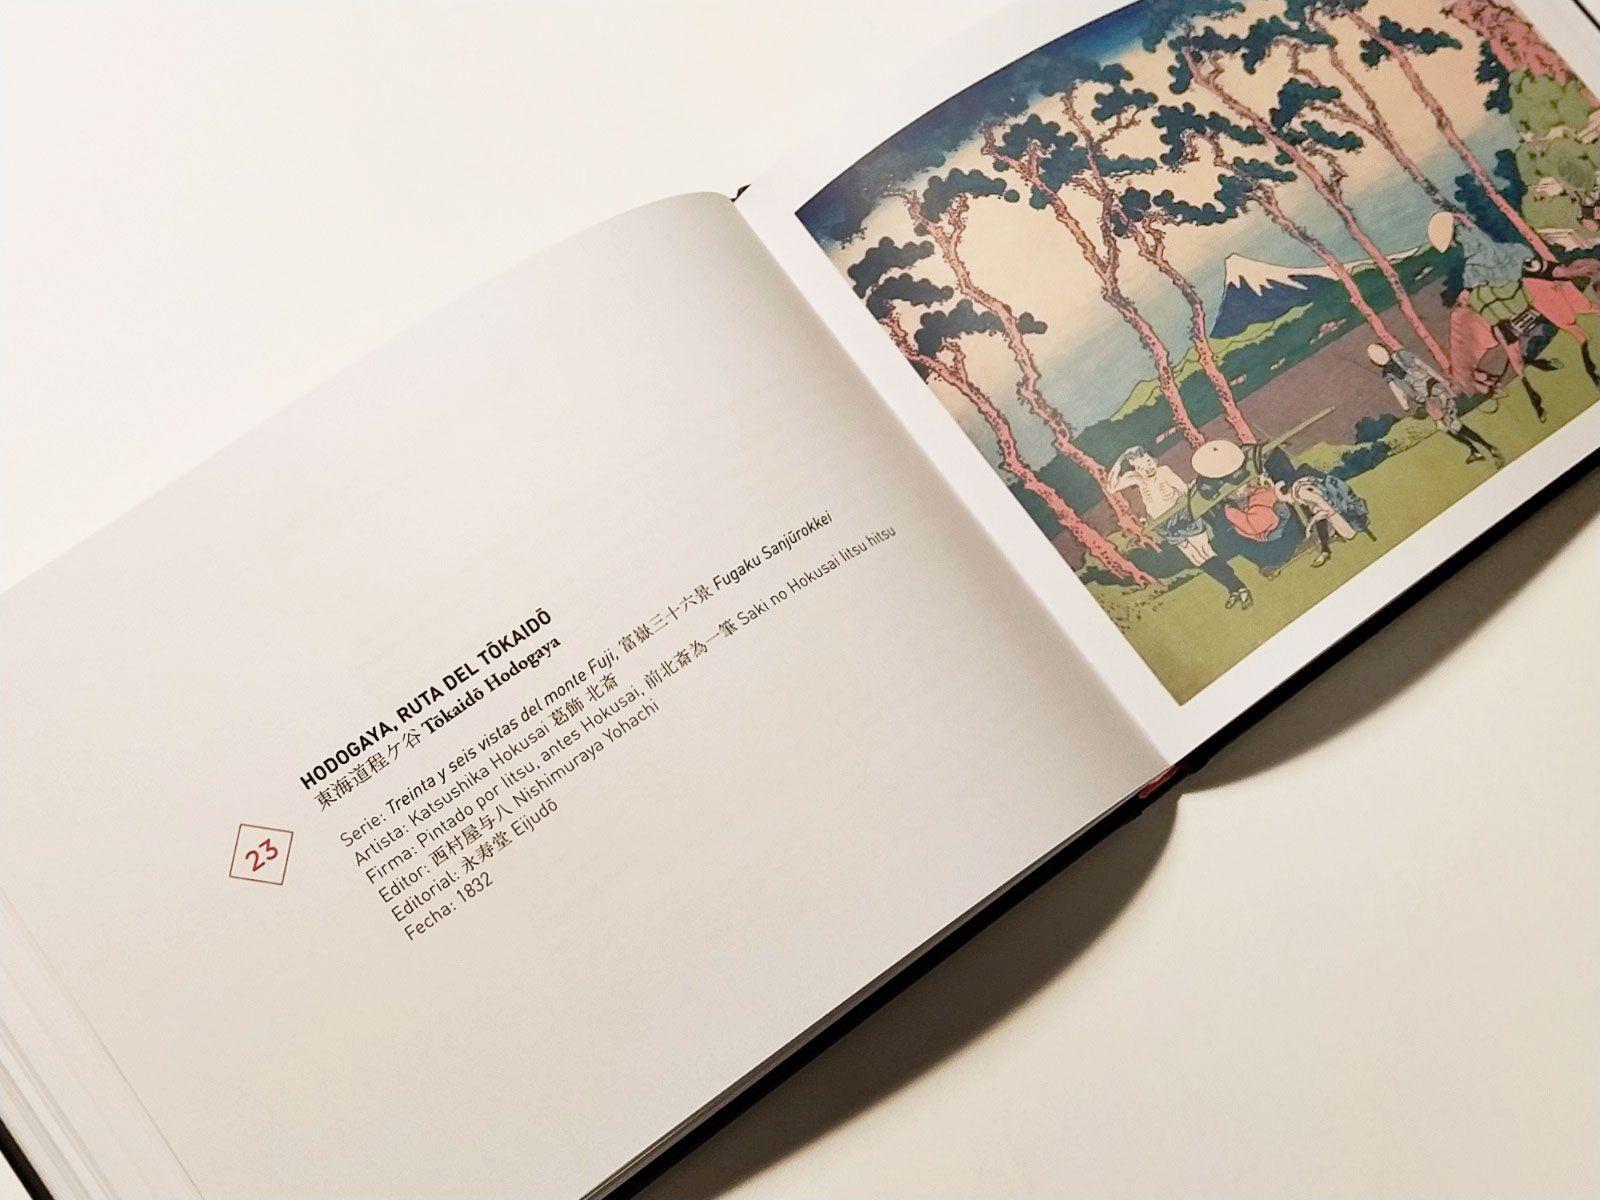 Hokusai-sansSoleilEdiciones (11)